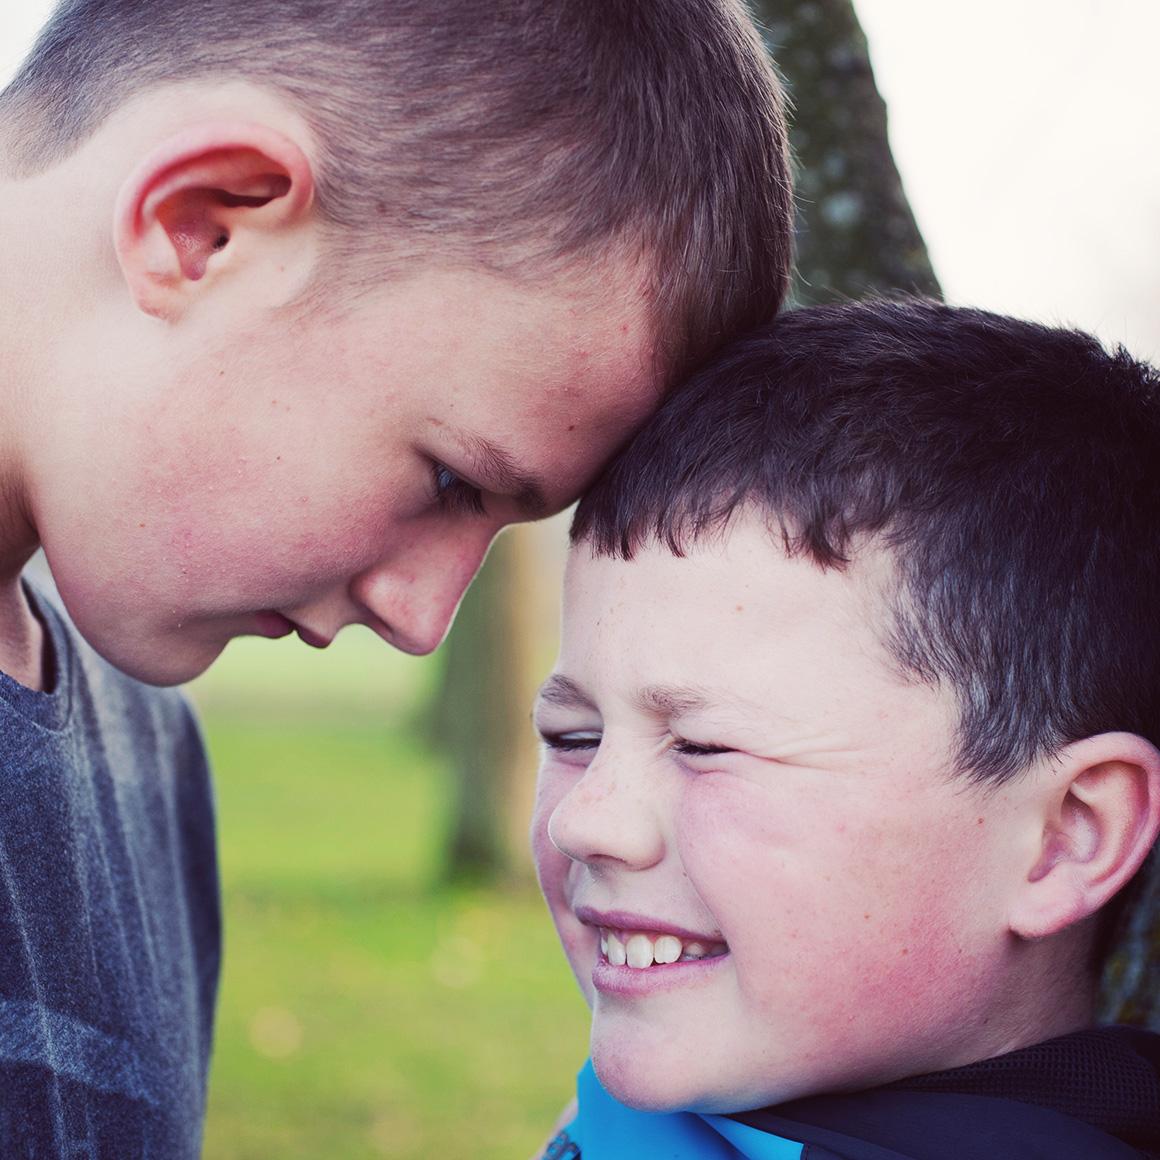 Bully picking on smaller boy